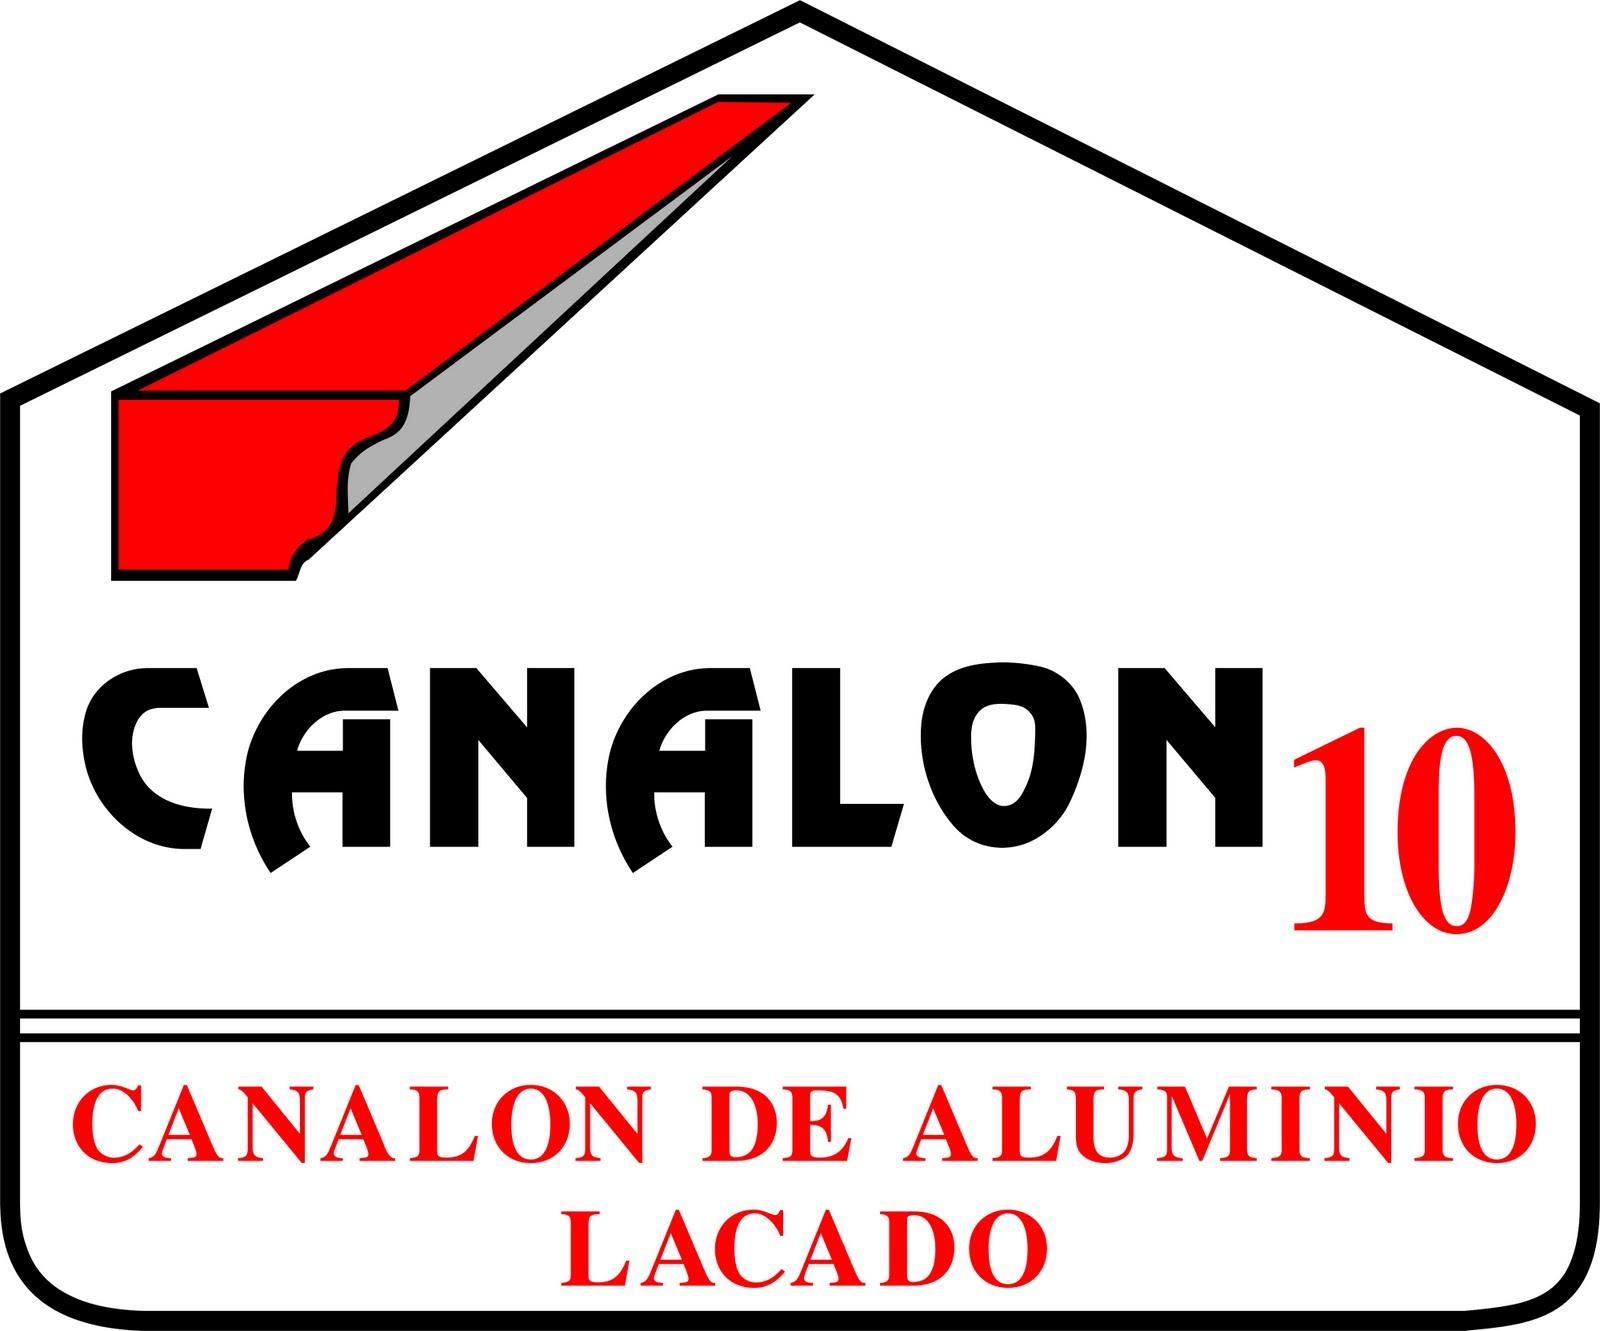 Canalon 10 - Canalon de aluminio ...